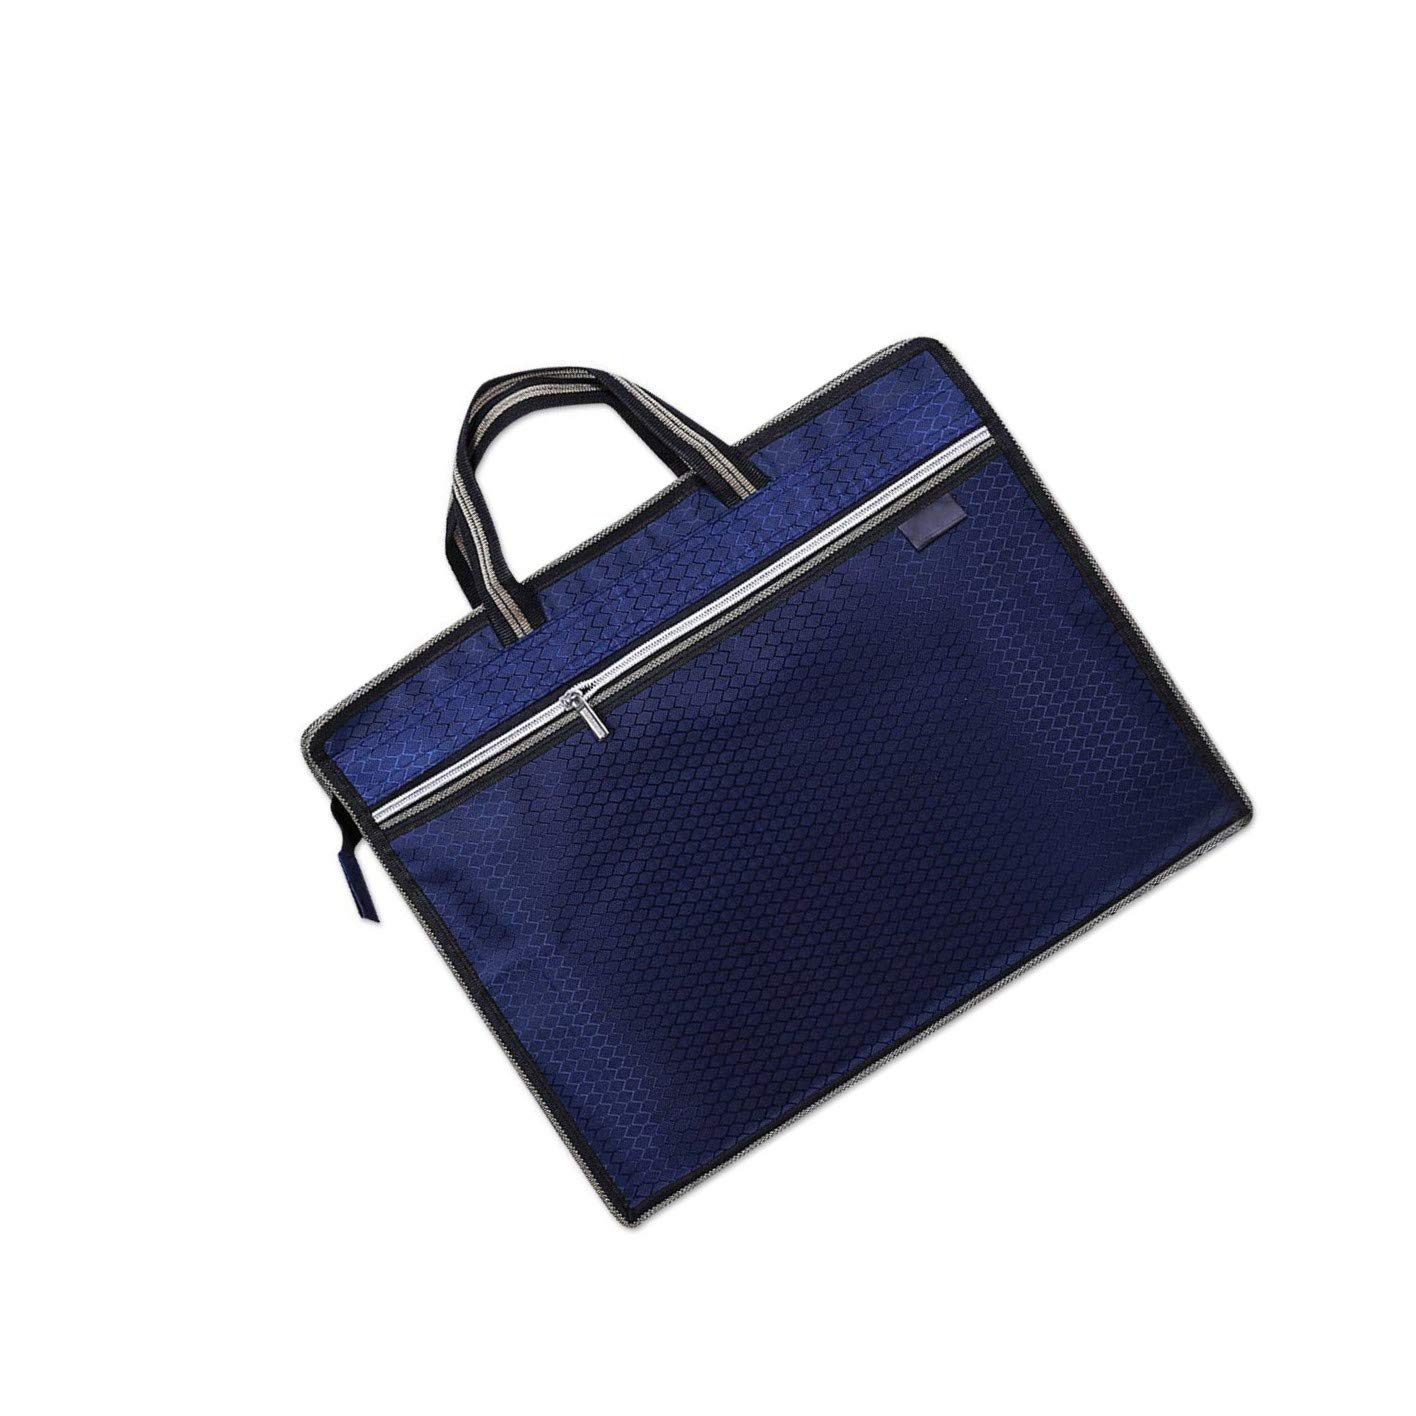 LuLyL 1 PC Hexagonal Notebook Sacoche Messenger Sacoche Portefeuille Organiseur pour Business Voyage Bleu